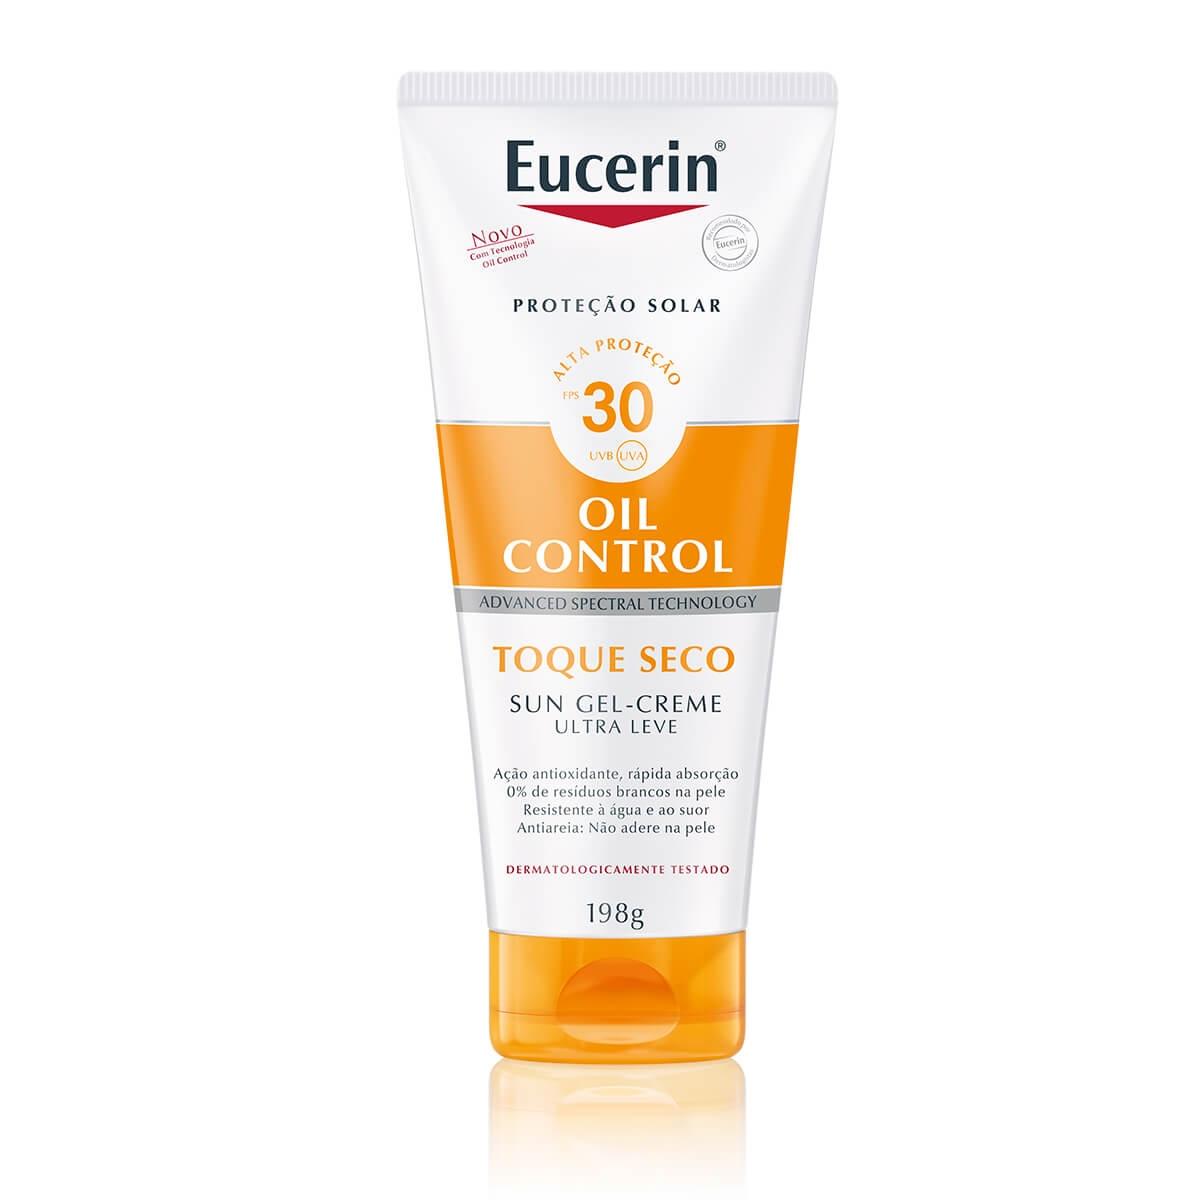 Protetor Solar Corporal Eucerin Sun Gel-Creme Oil Control Toque Seco FPS30 com 200ml 200ml